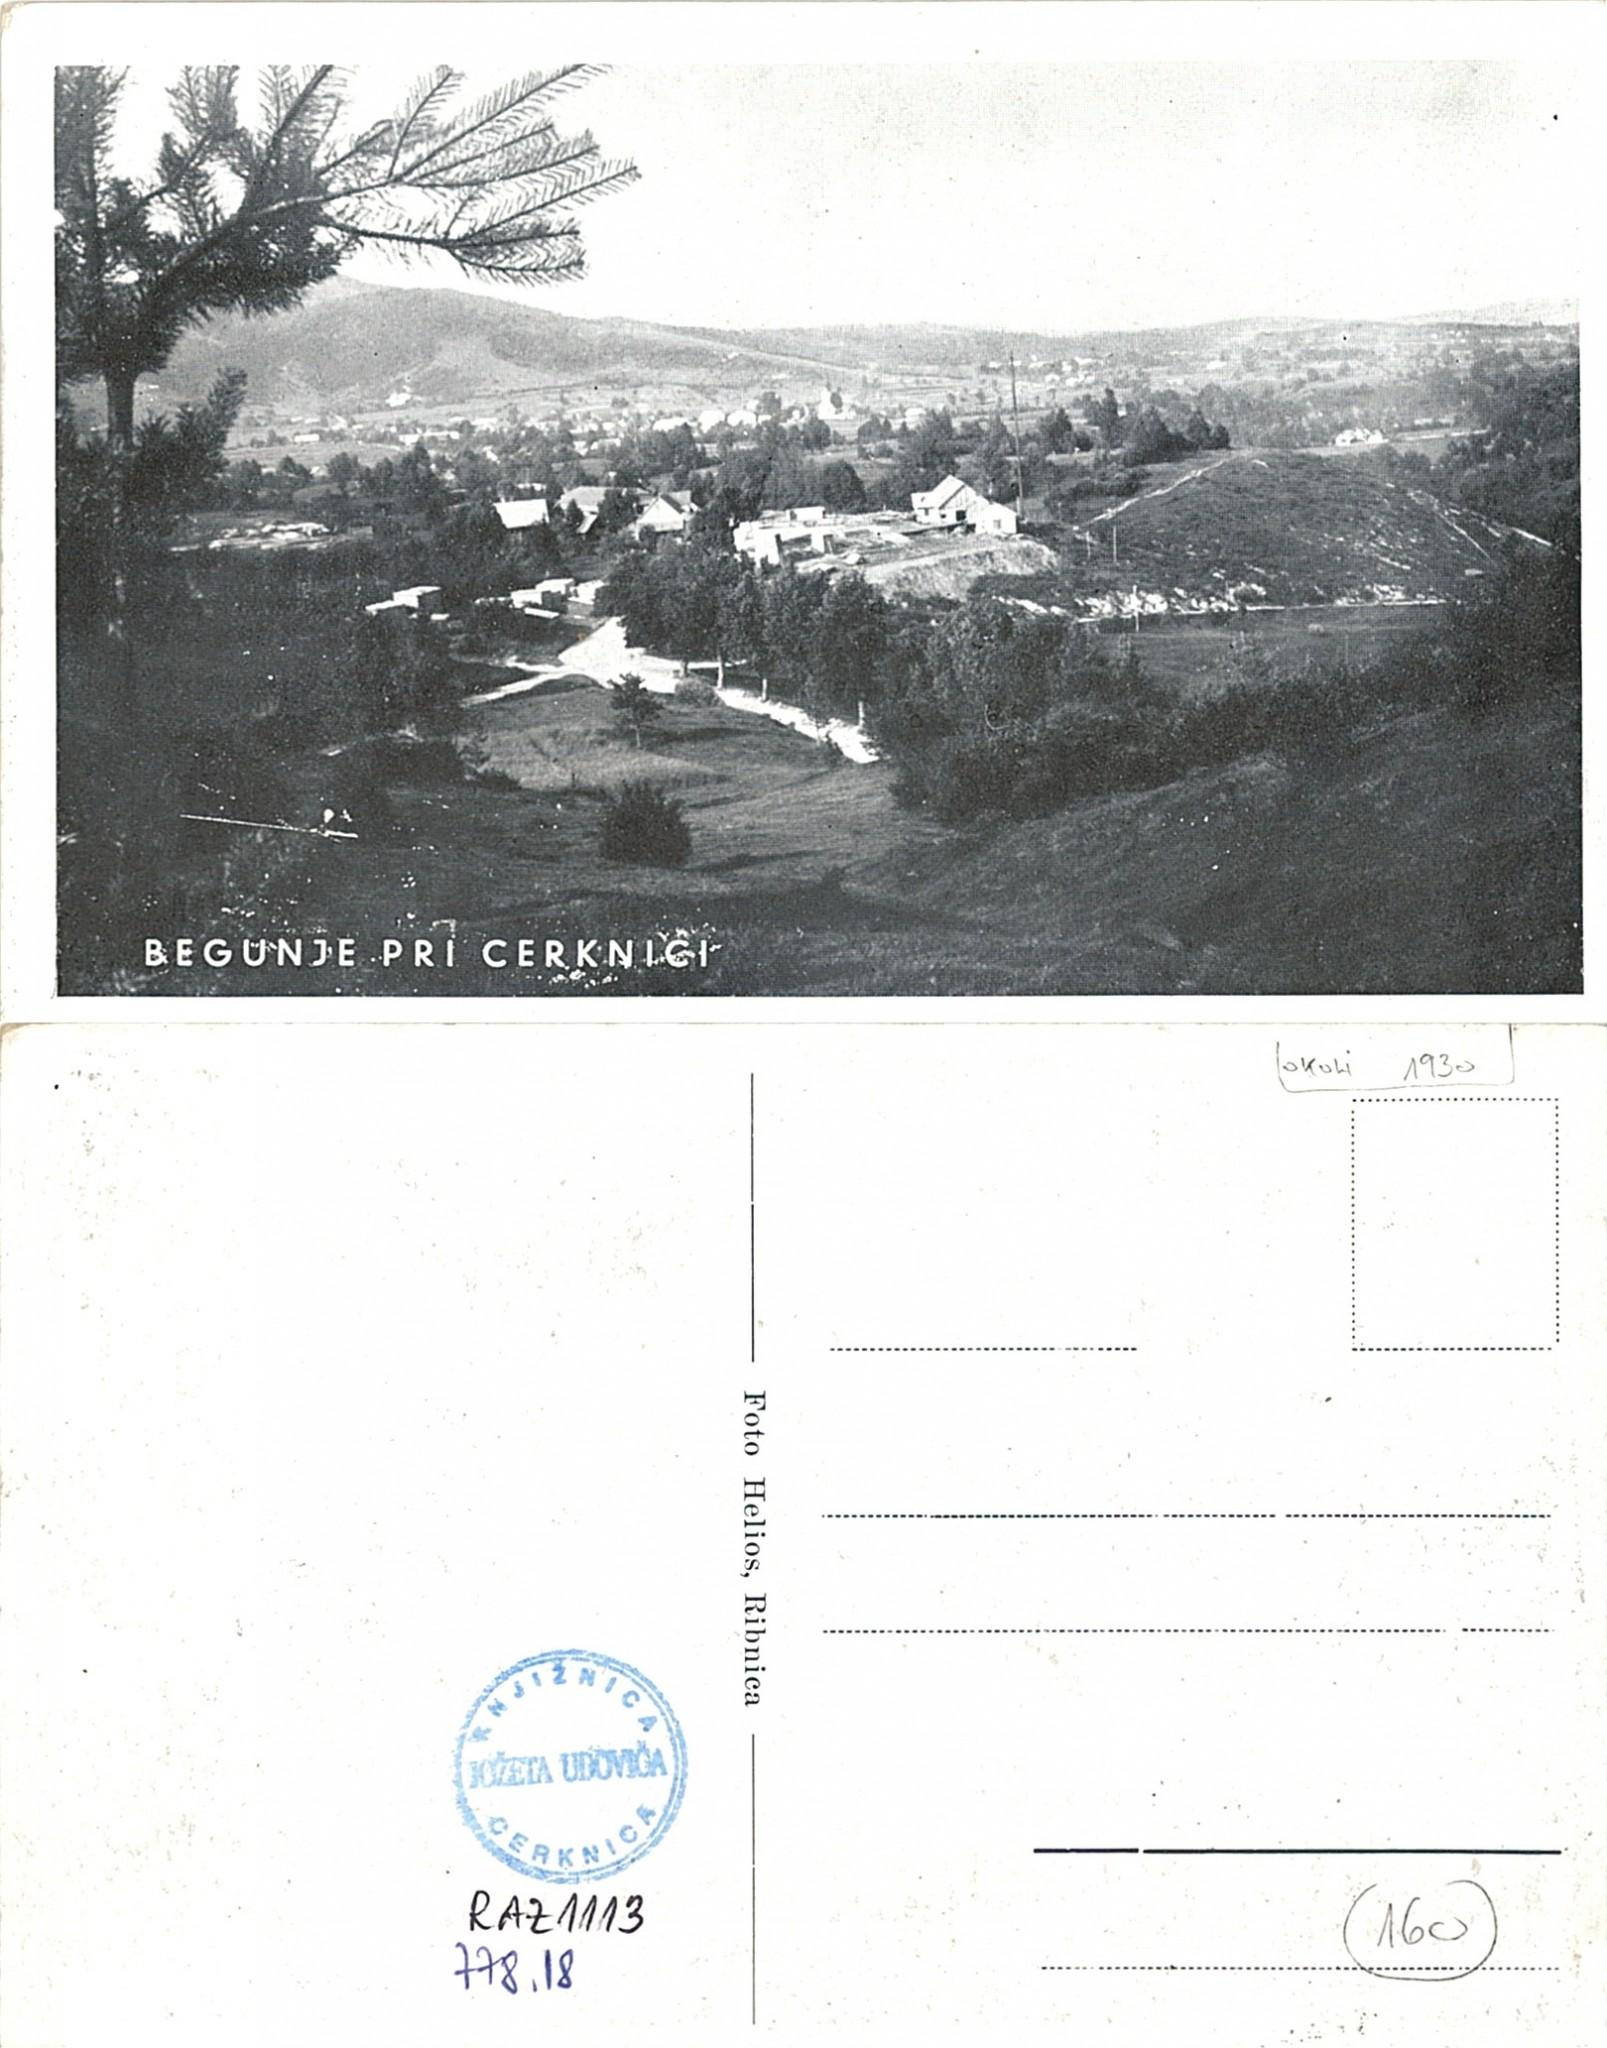 begunje28 - Begunje